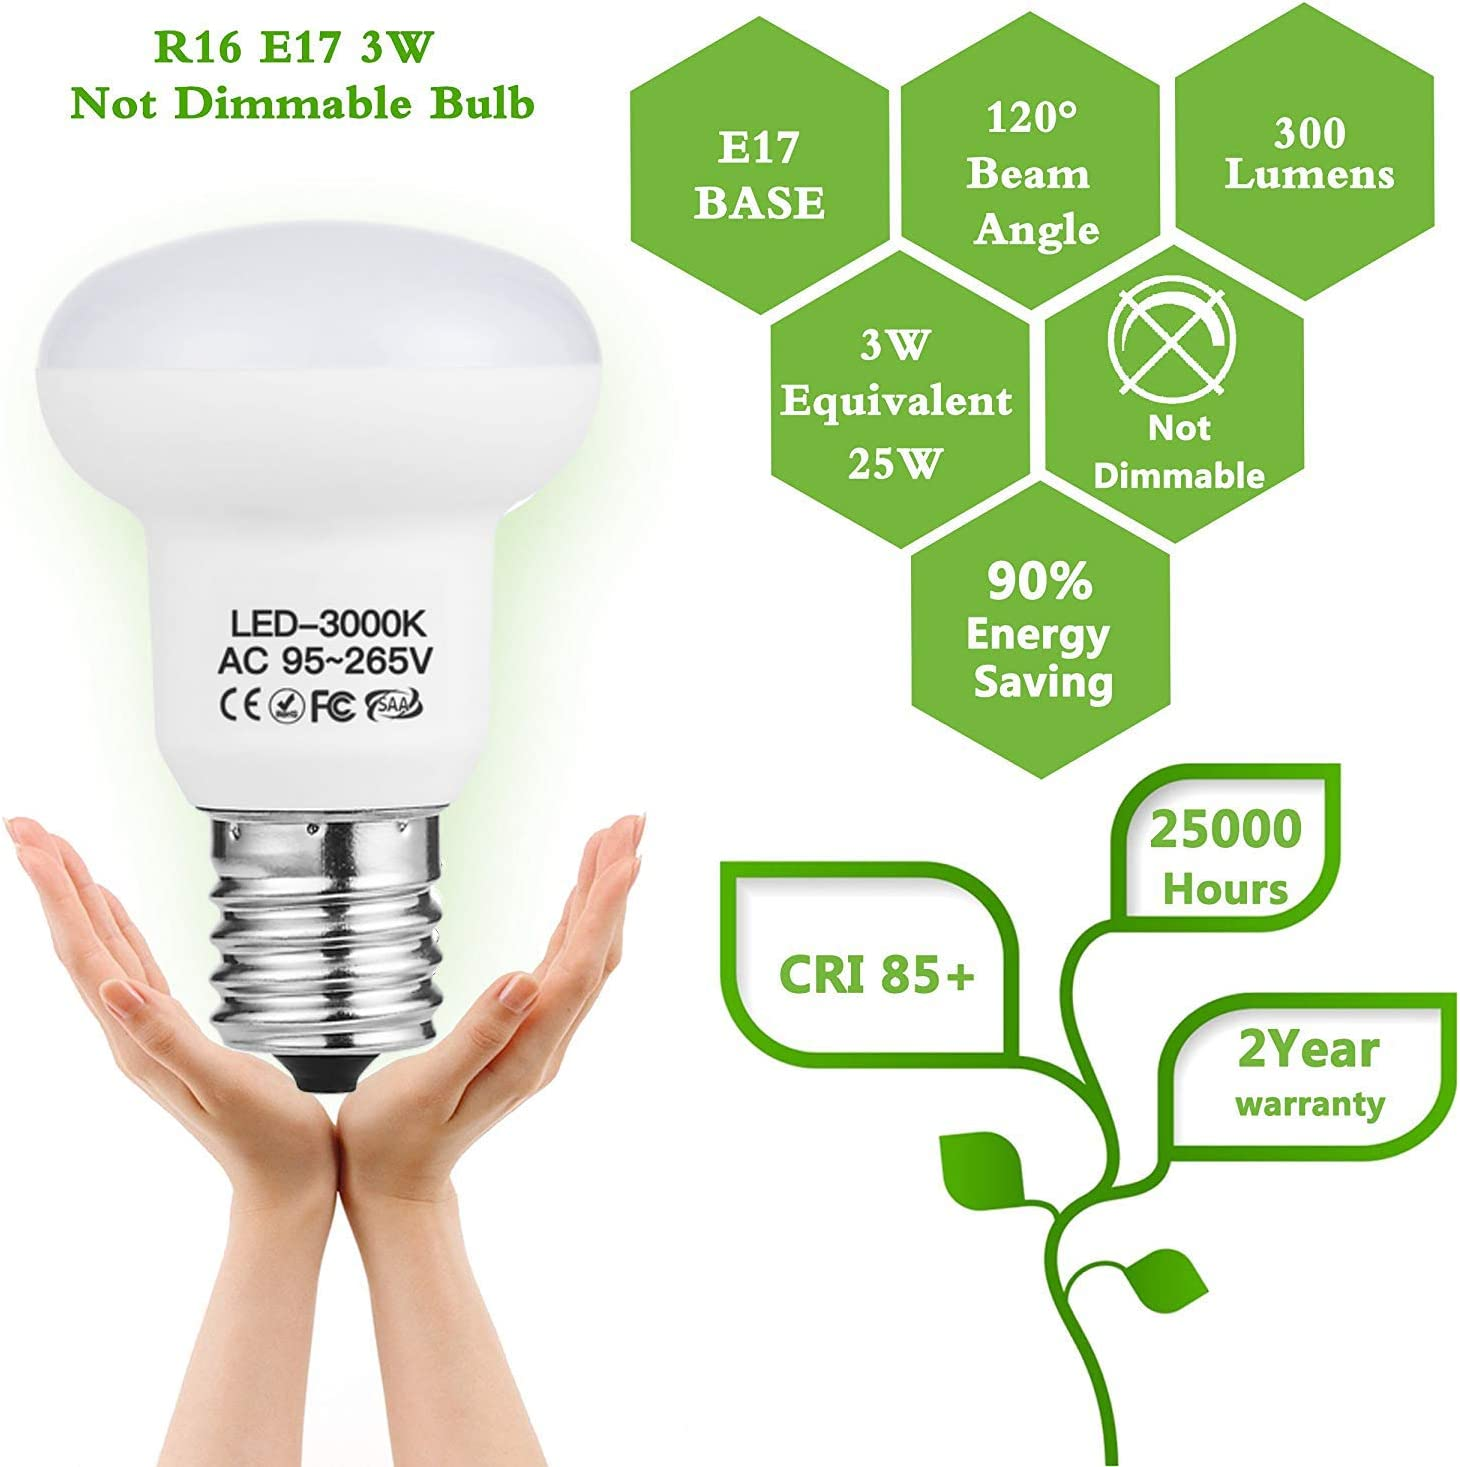 R14 LED light bulbs 3W 300Lumen E17 Base 5000K Daylight White Household 120V 120 Degree CRI85+ Reflector Circular Umbrella Mushroom Lamp Non Dimmable 4 Pack WELLHOME WH-BR14//R14-3W-L Replaces 25 Watt Traditional light bulbs